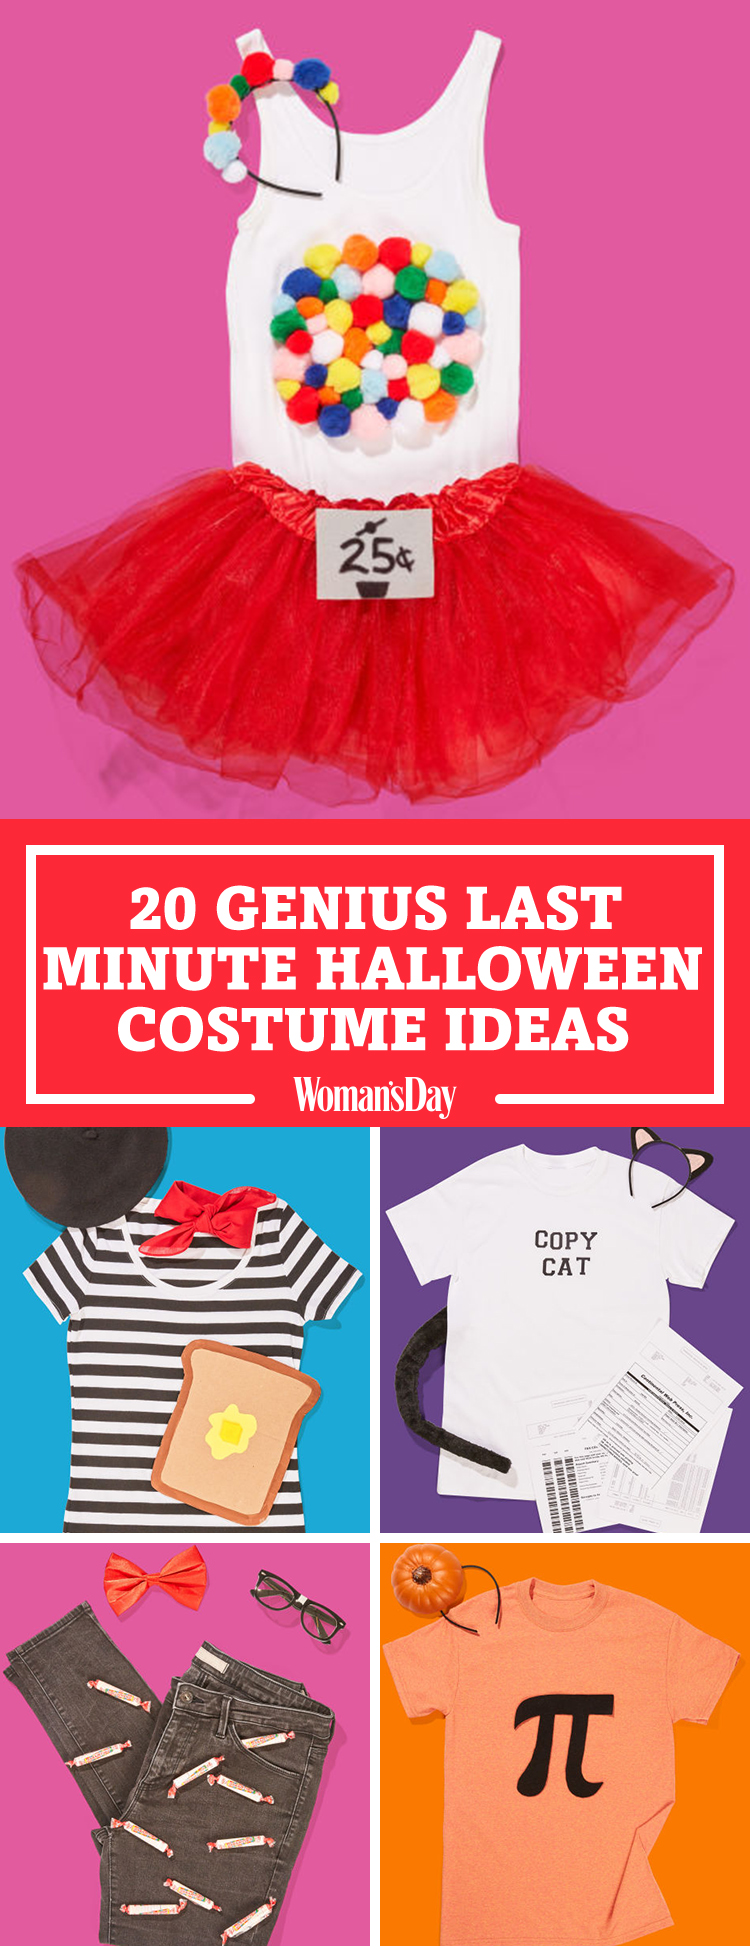 30 last minute halloween costume ideas 2017 clever. Black Bedroom Furniture Sets. Home Design Ideas